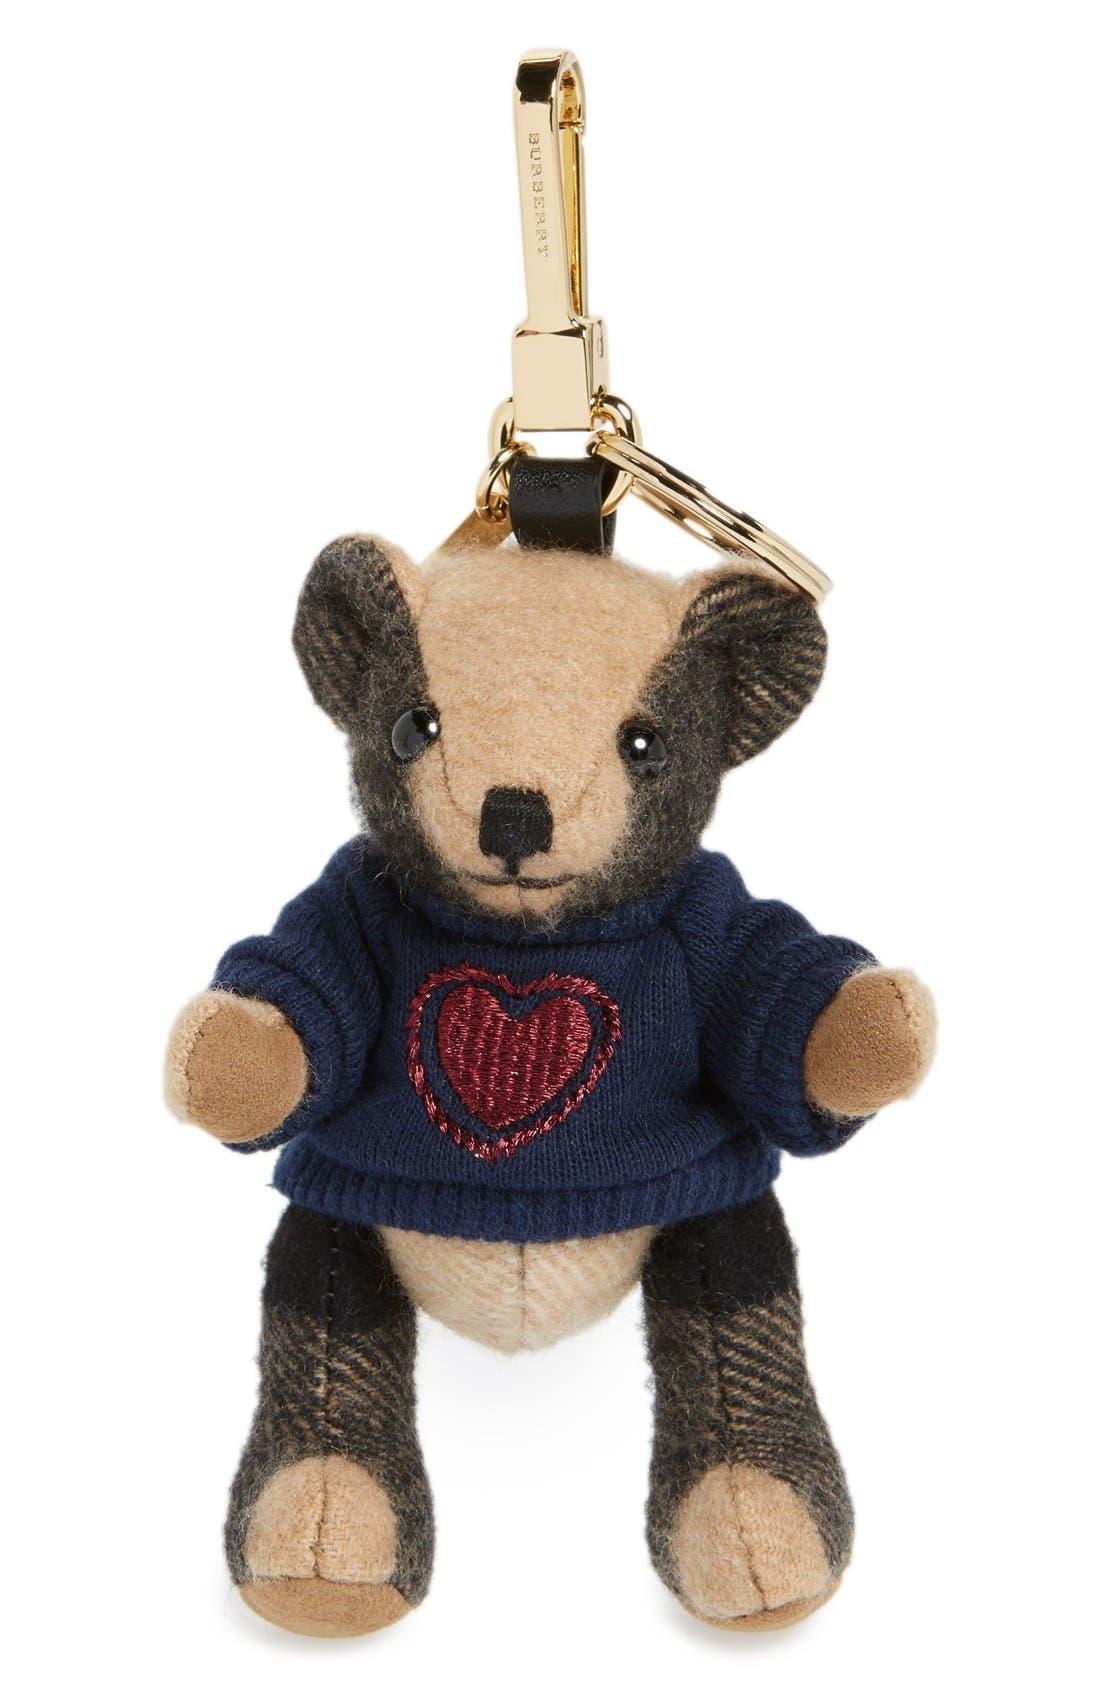 BURBERRY,                             'Thomas Bear Heart Sweater' Check Cashmere Bag Charm,                             Main thumbnail 1, color,                             231